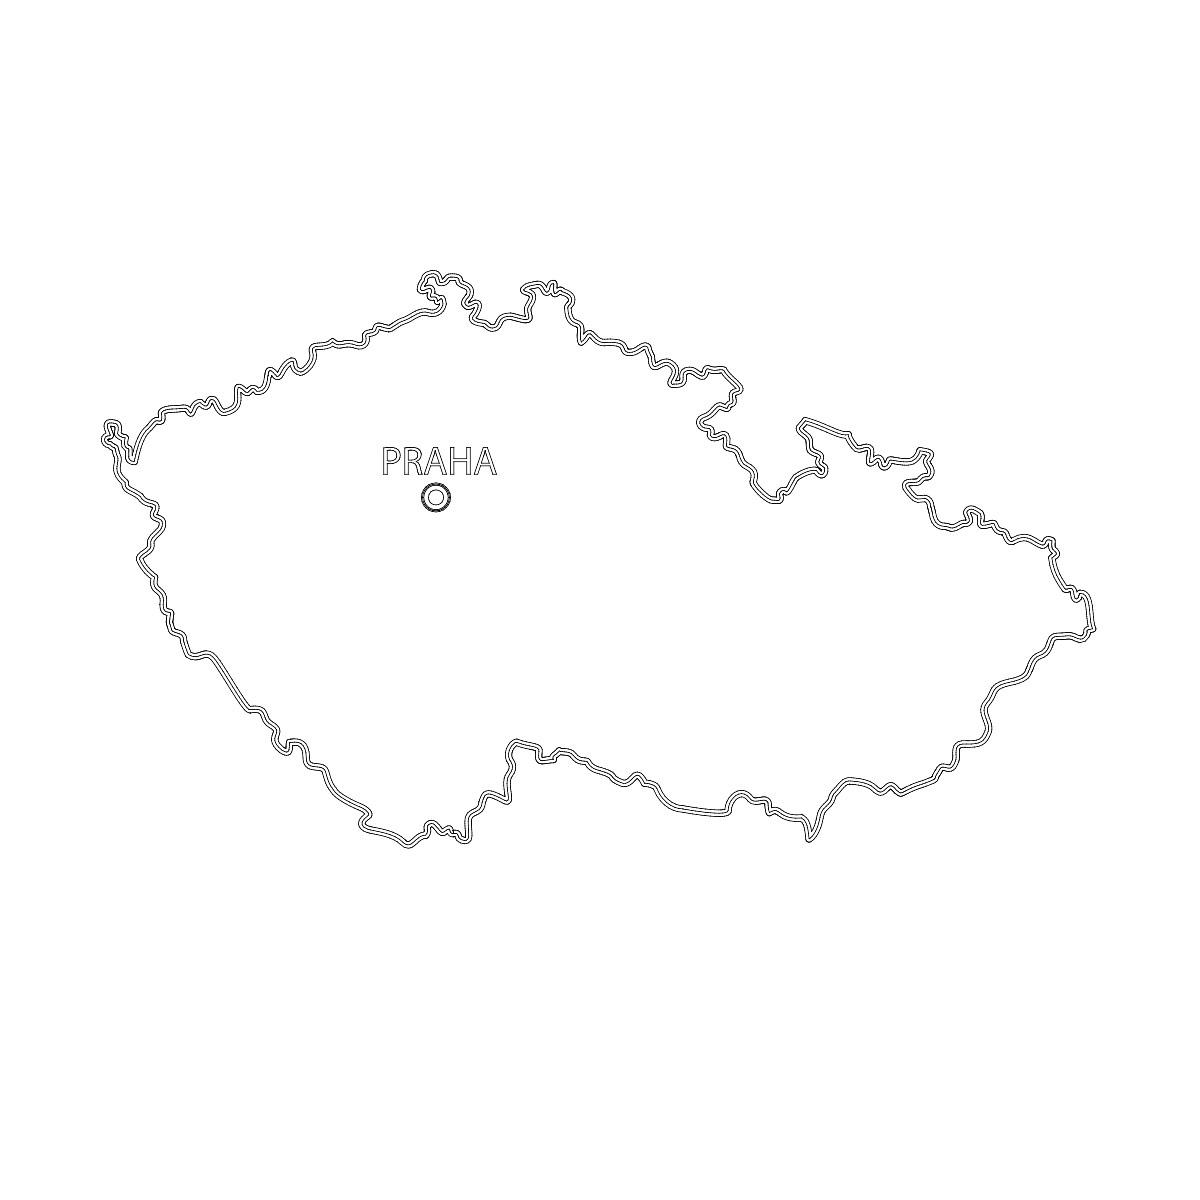 Stahnete Si Zdarma Mapu Cr V Krivkach Design Portal